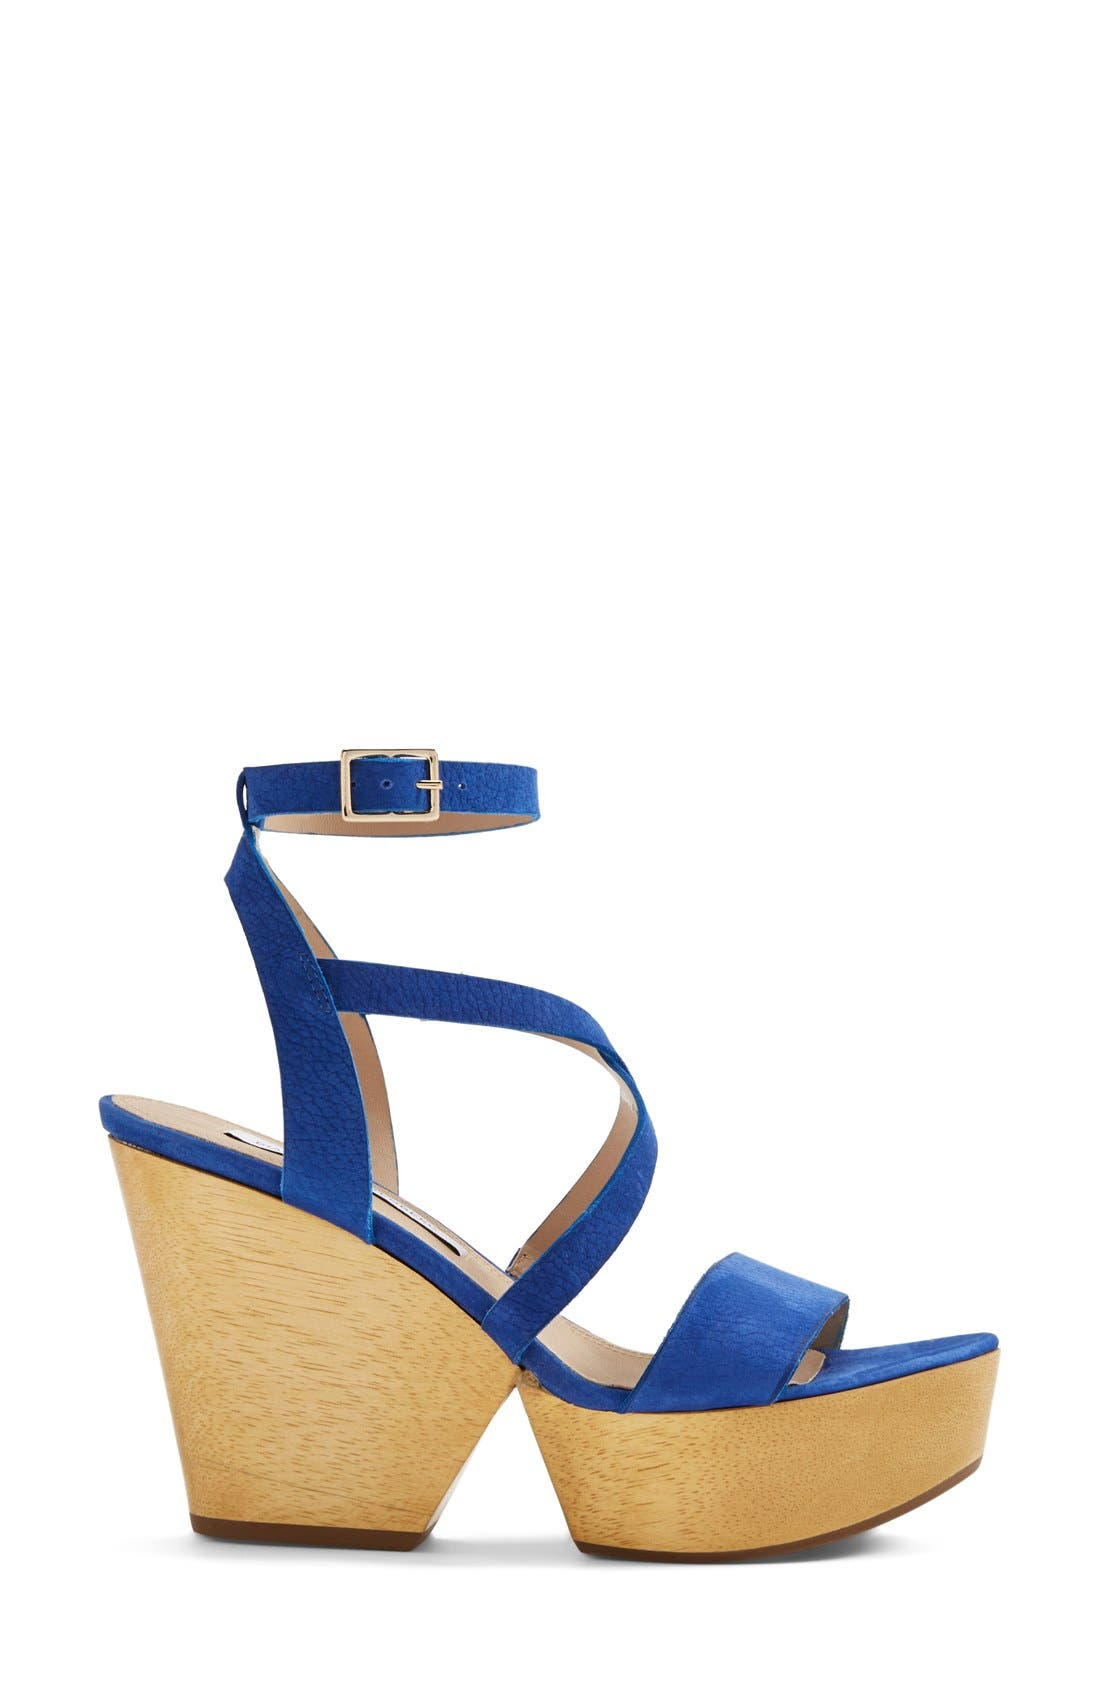 'Lamille' Leather Platform Wedge Sandal,                             Alternate thumbnail 4, color,                             Blue Riviera